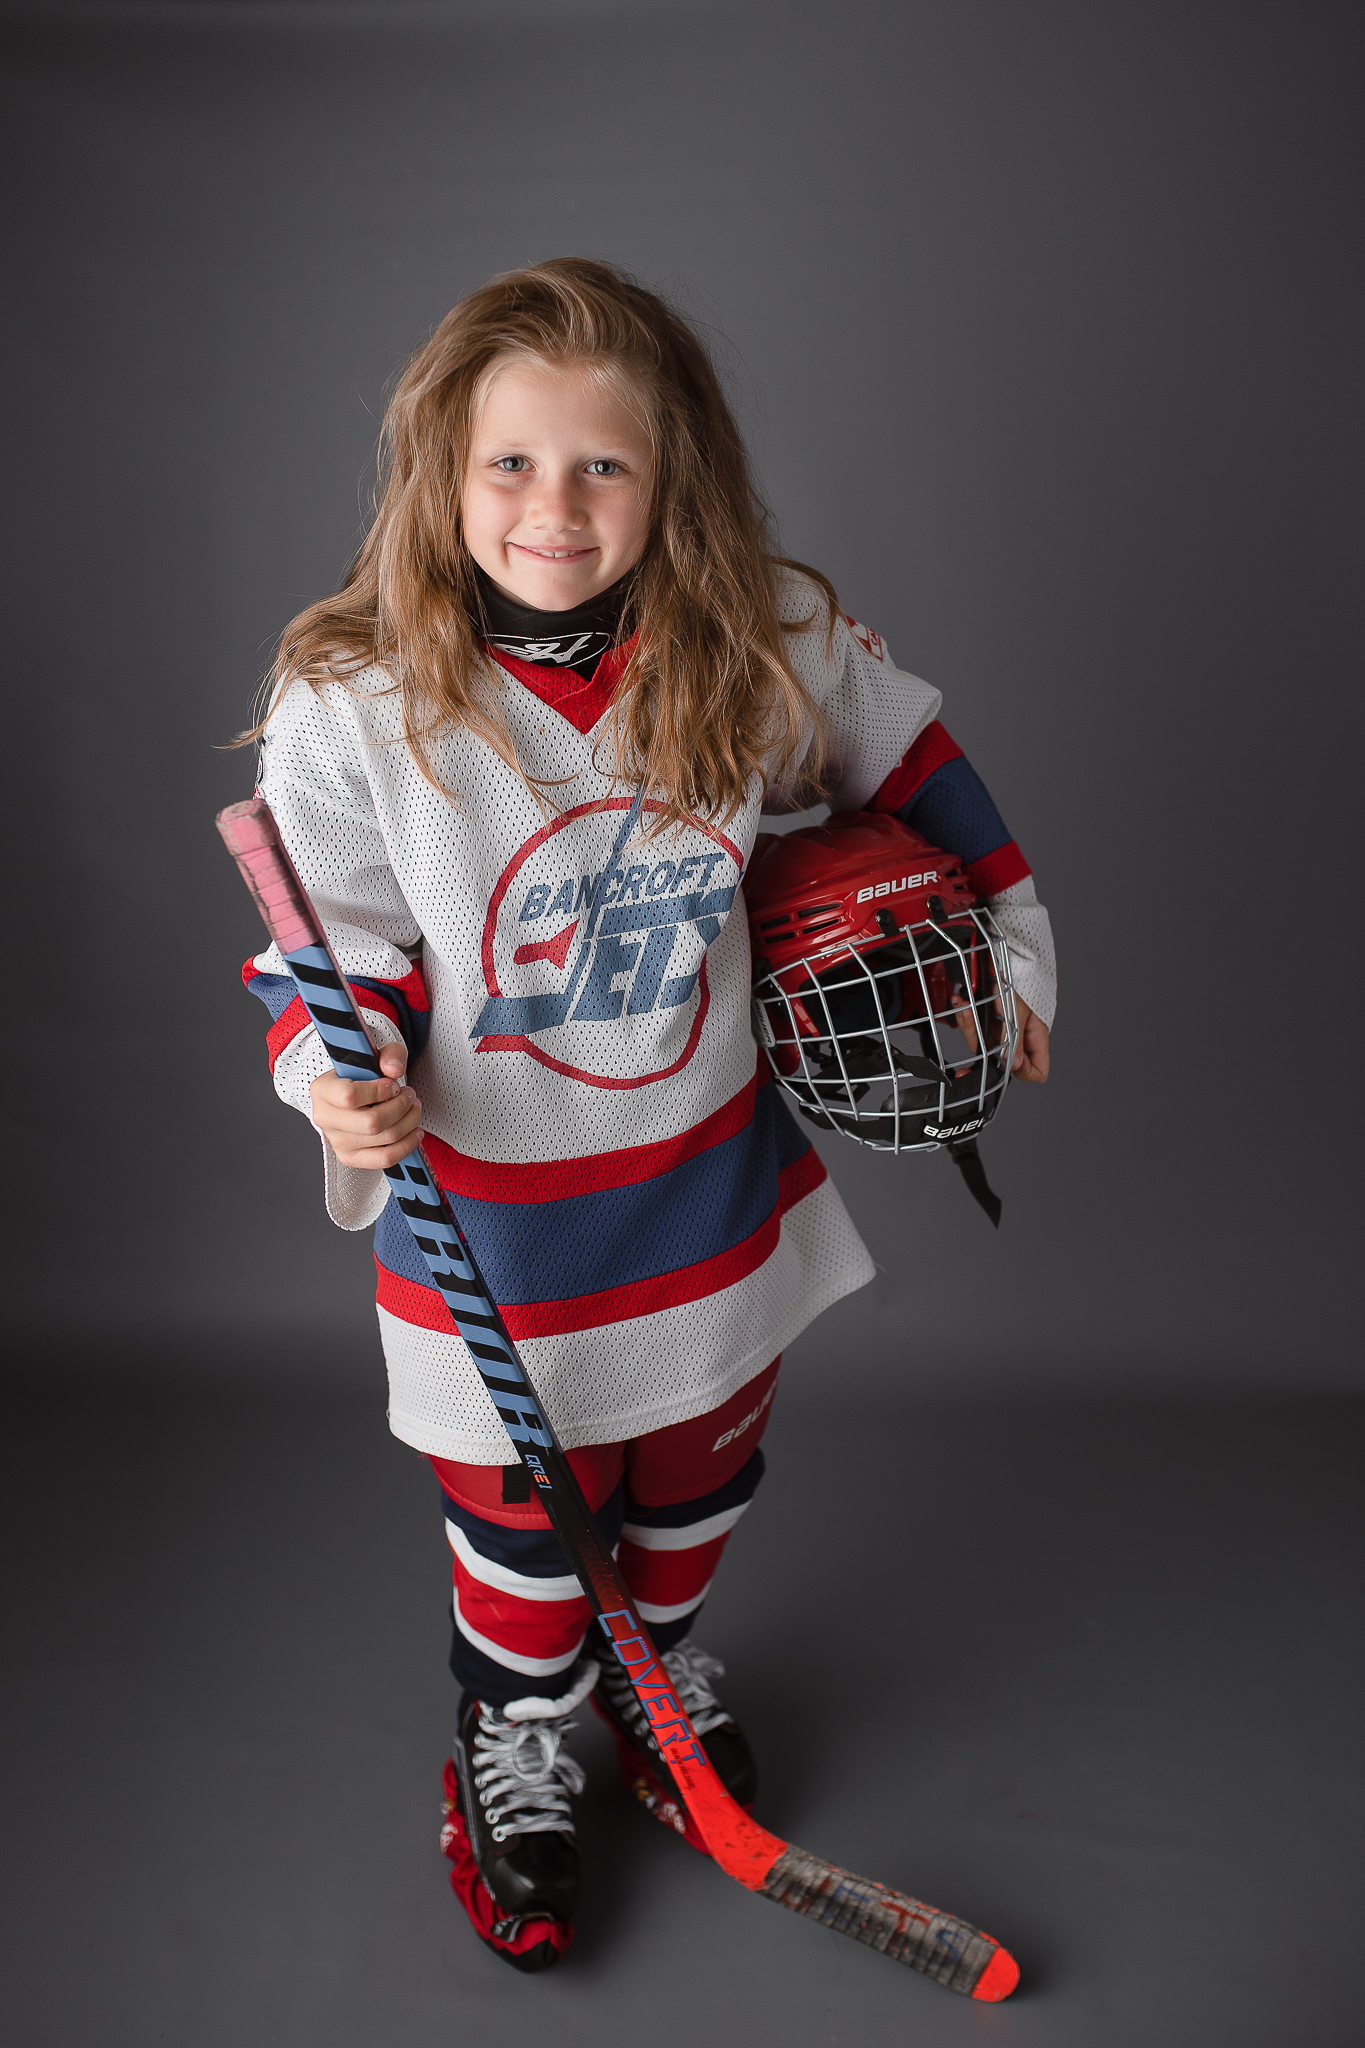 Naomi Lucienne Peterborough Photography Portrait Photography Children Photography Family Photography-23.jpg